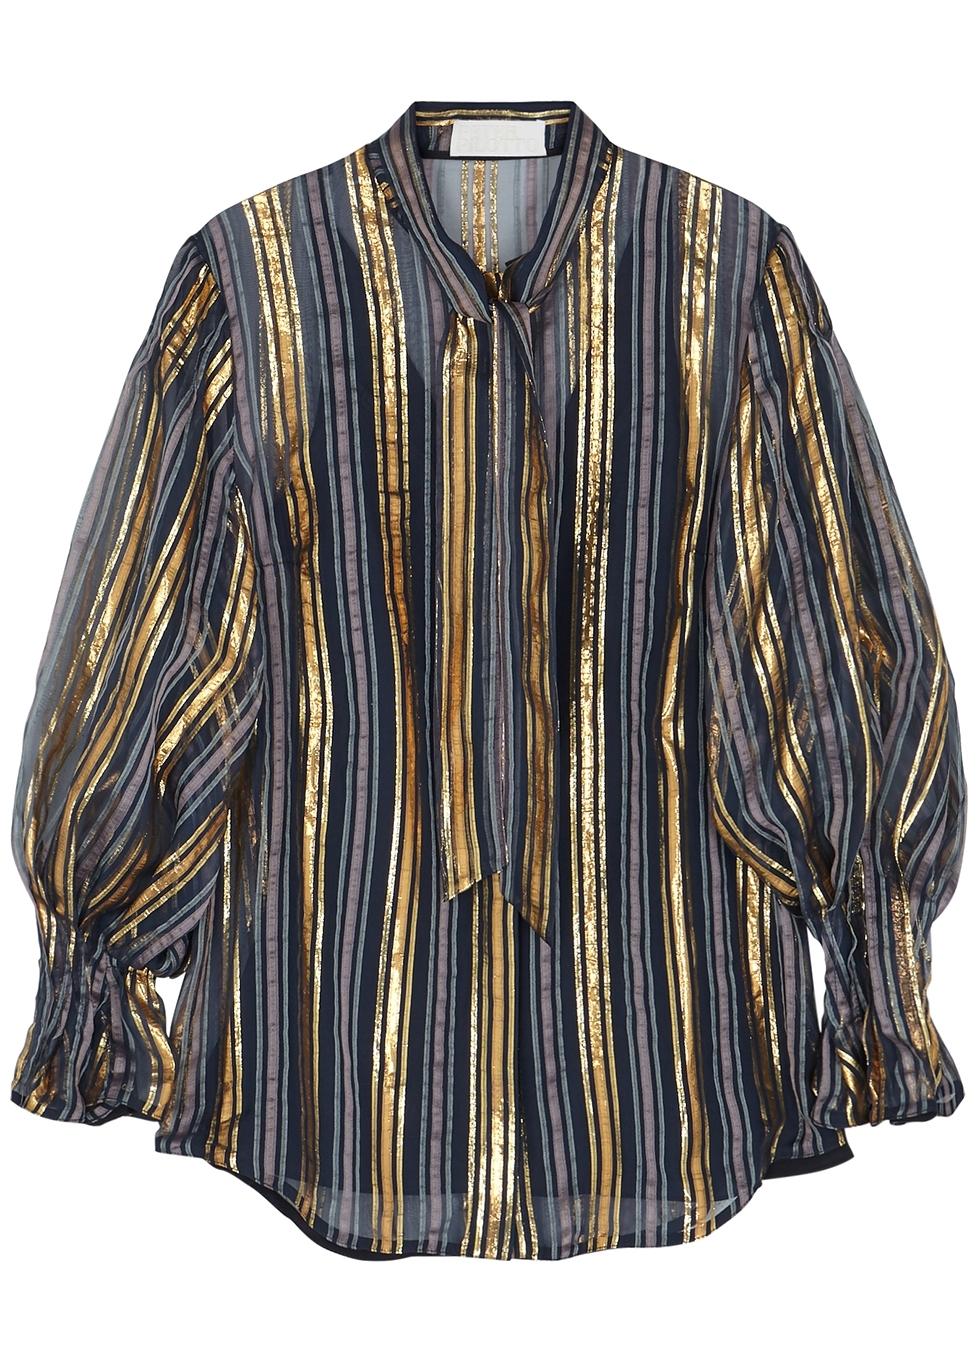 17ac90421e6775 Women s Designer Tops - Lace   Silk - Harvey Nichols